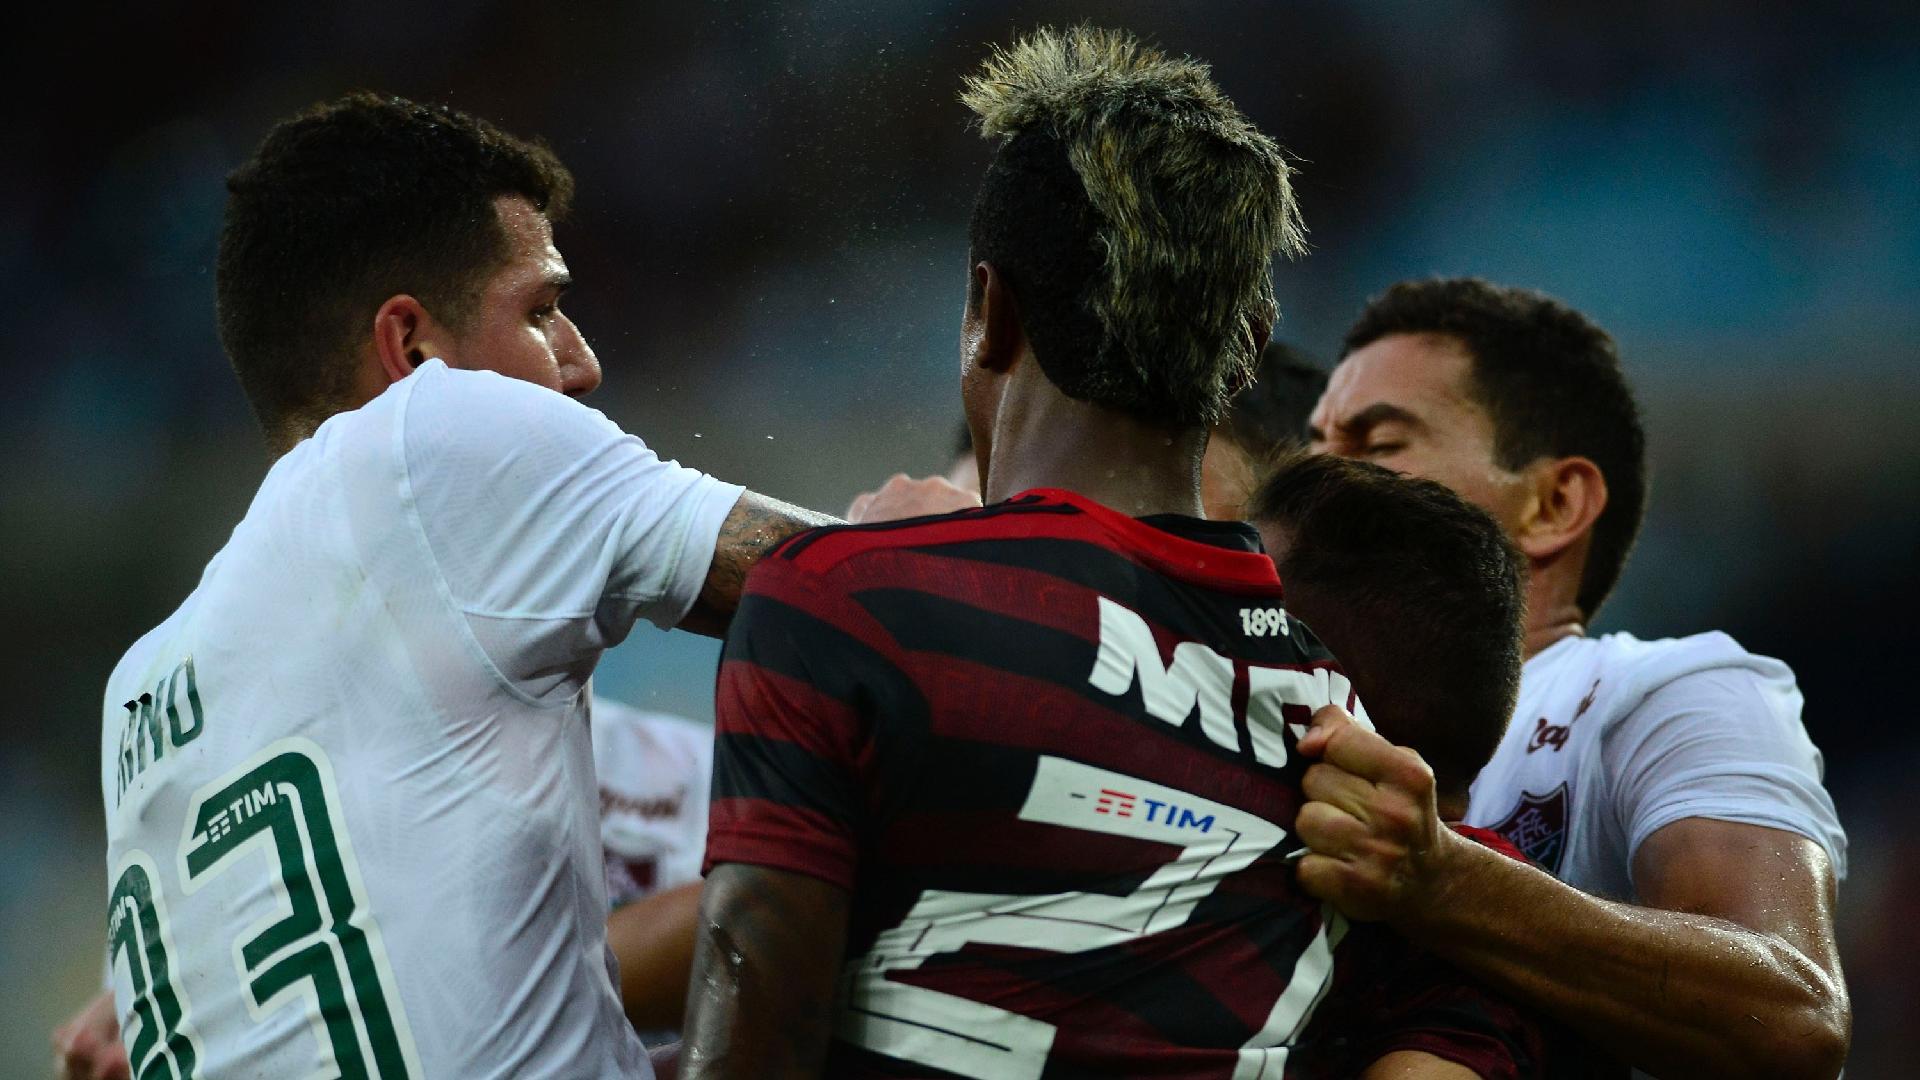 Jogadores brigam durante Flamengo x Fluminense